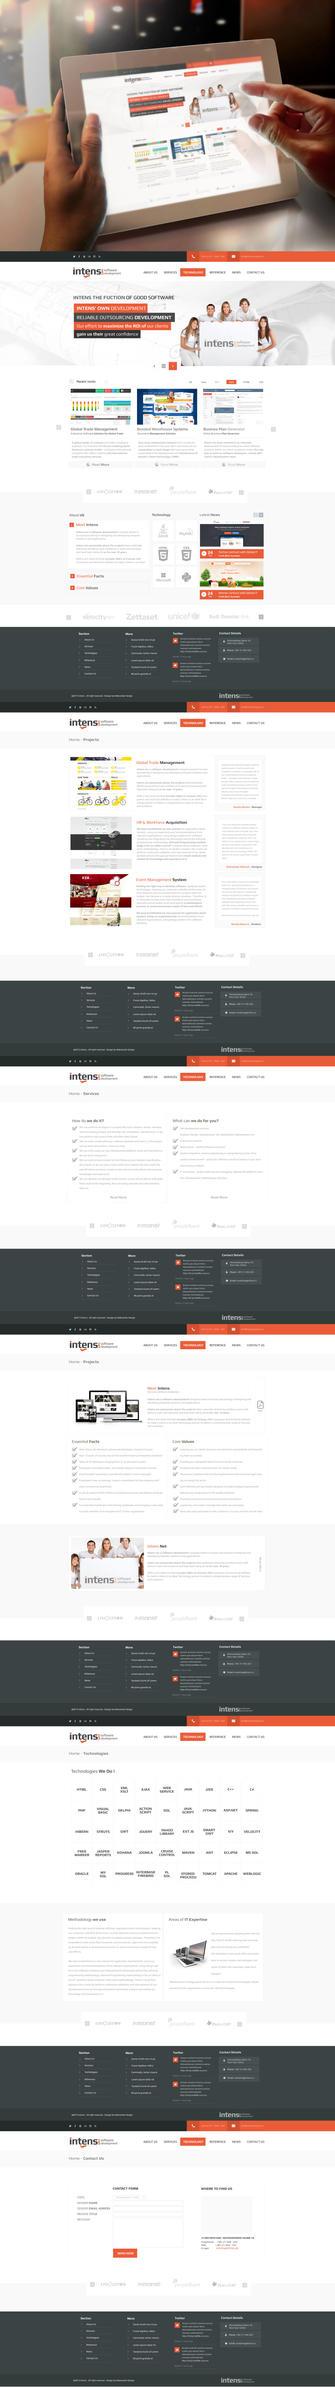 Software Company Web Design by vasiligfx